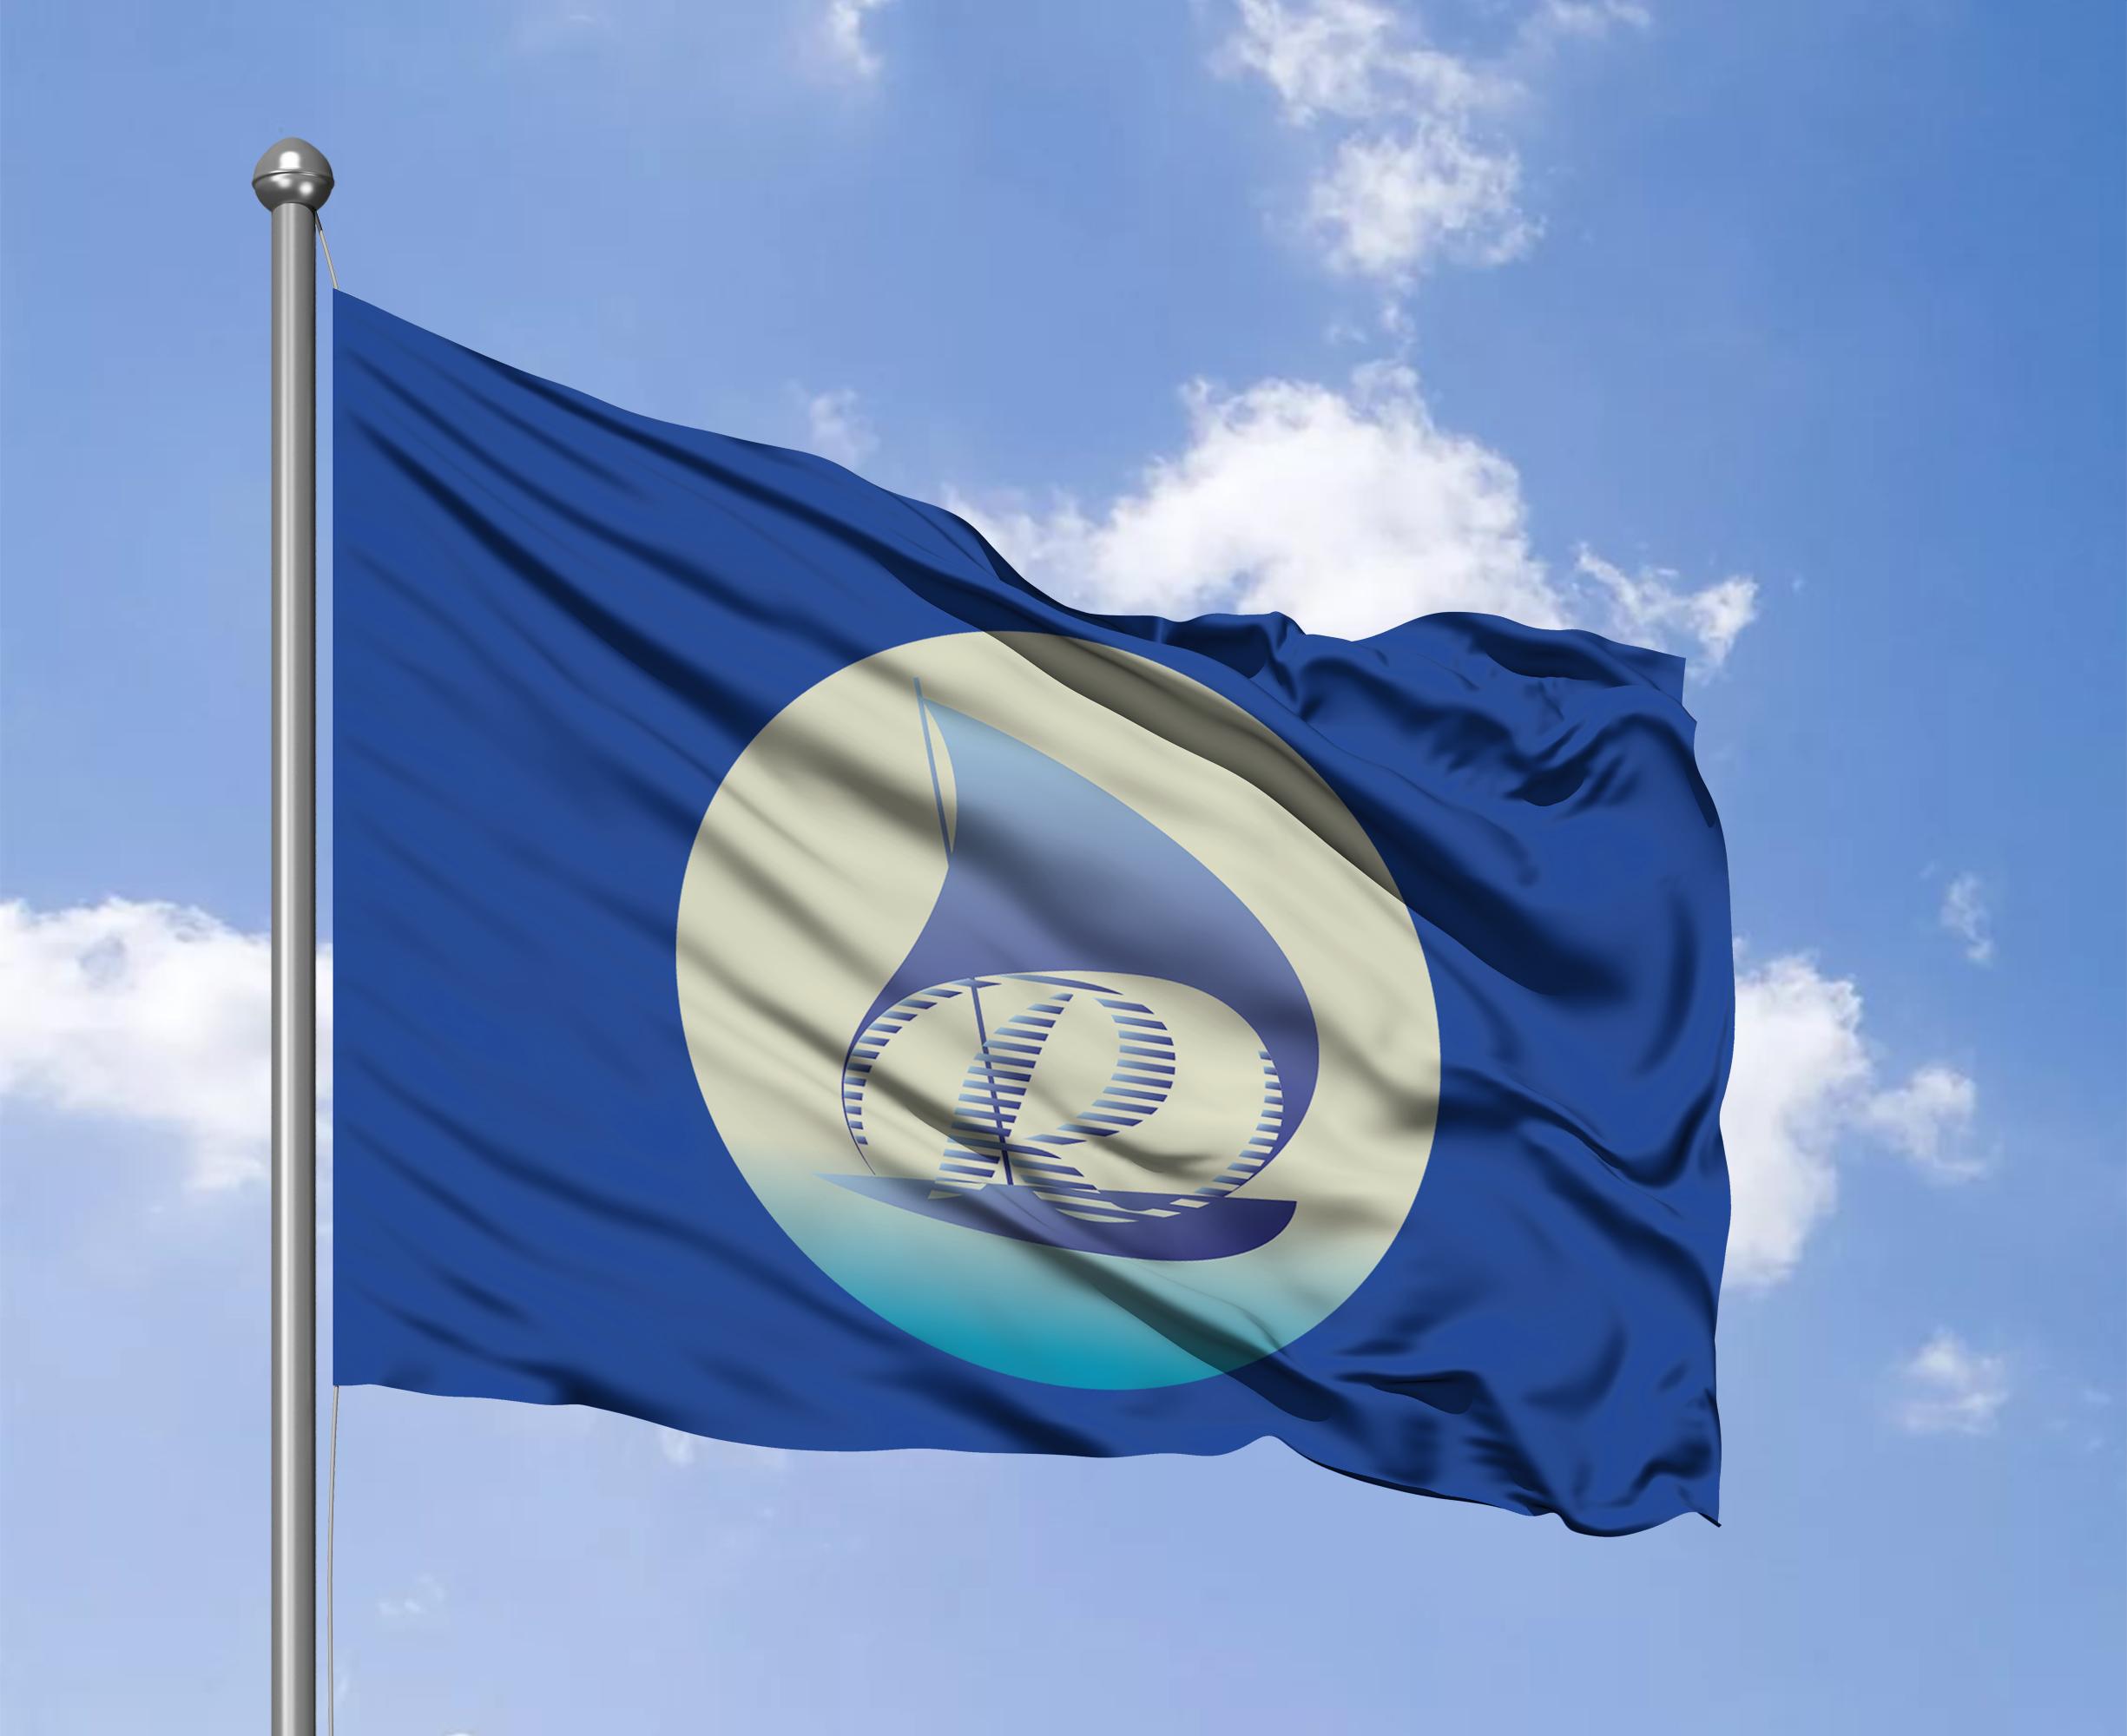 Разработка логотипа корпоративной парусной регаты фото f_6755c1259d1ed1bc.jpg